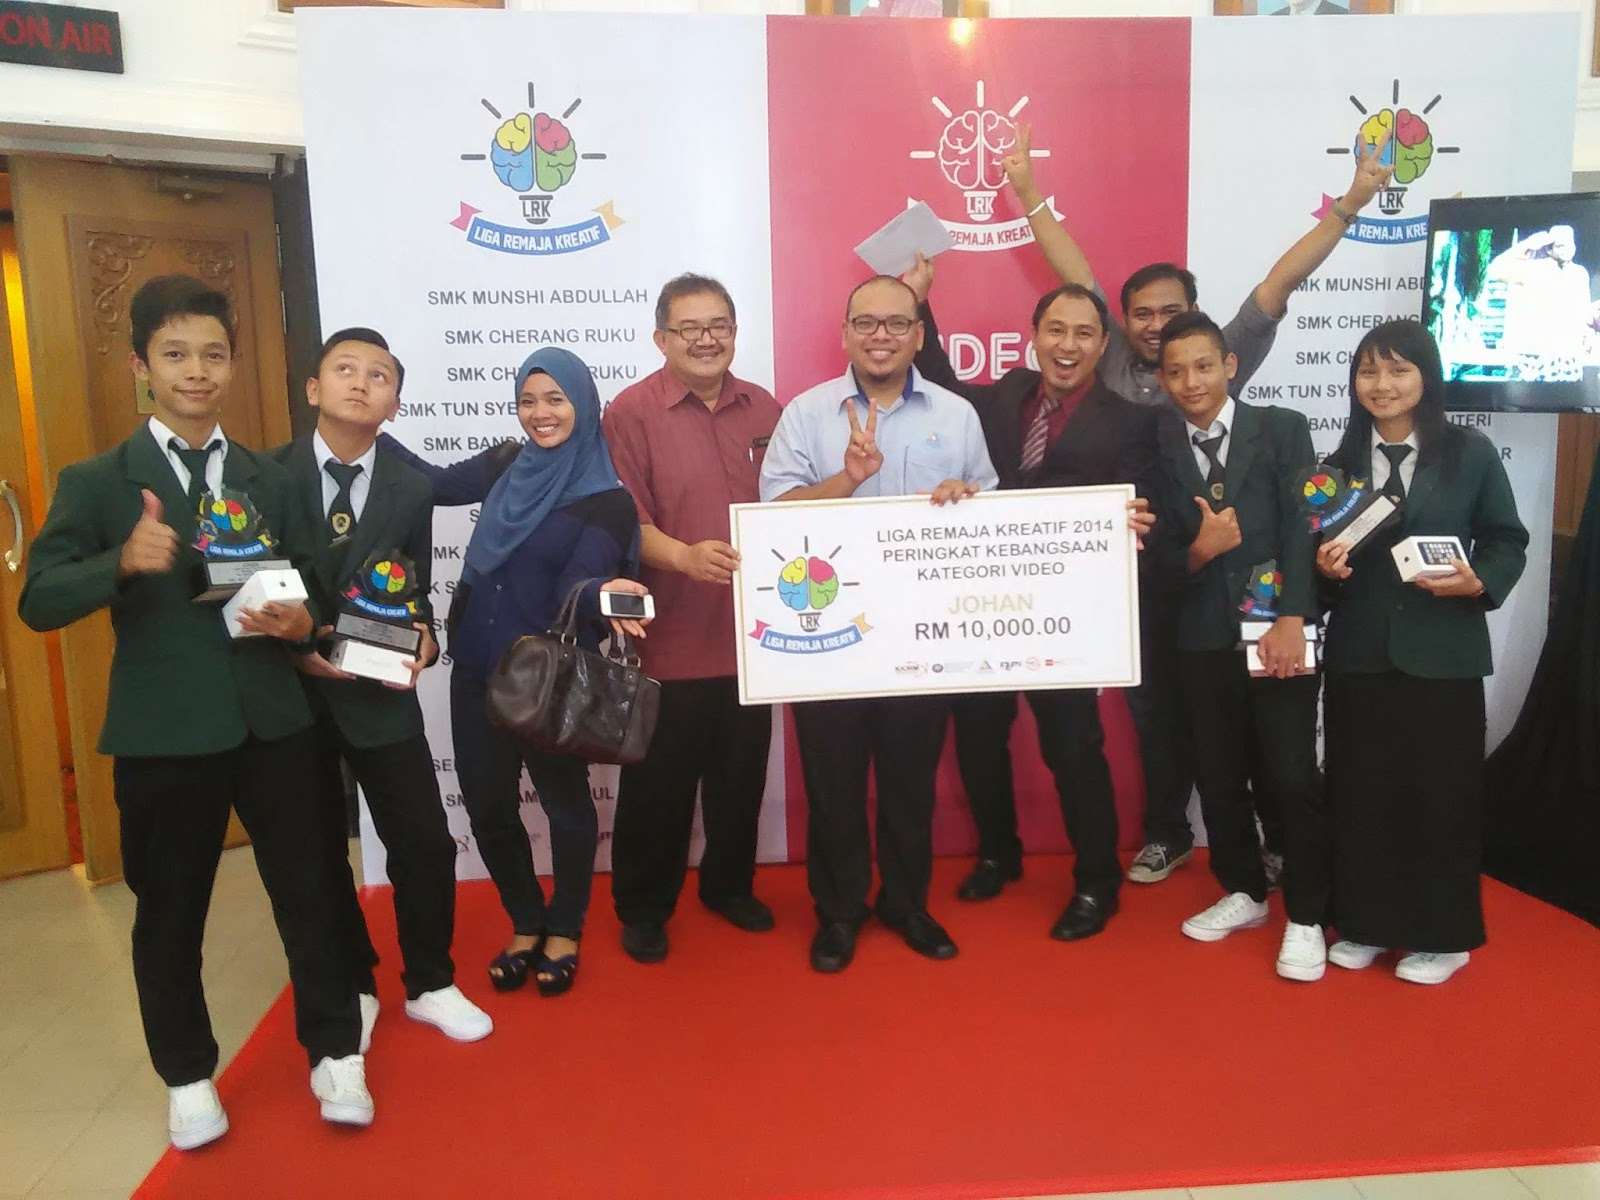 Pemenang Liga Remaja Kreatif 2014 : SMK Luar Bandar No.1 Sibu Sarawak